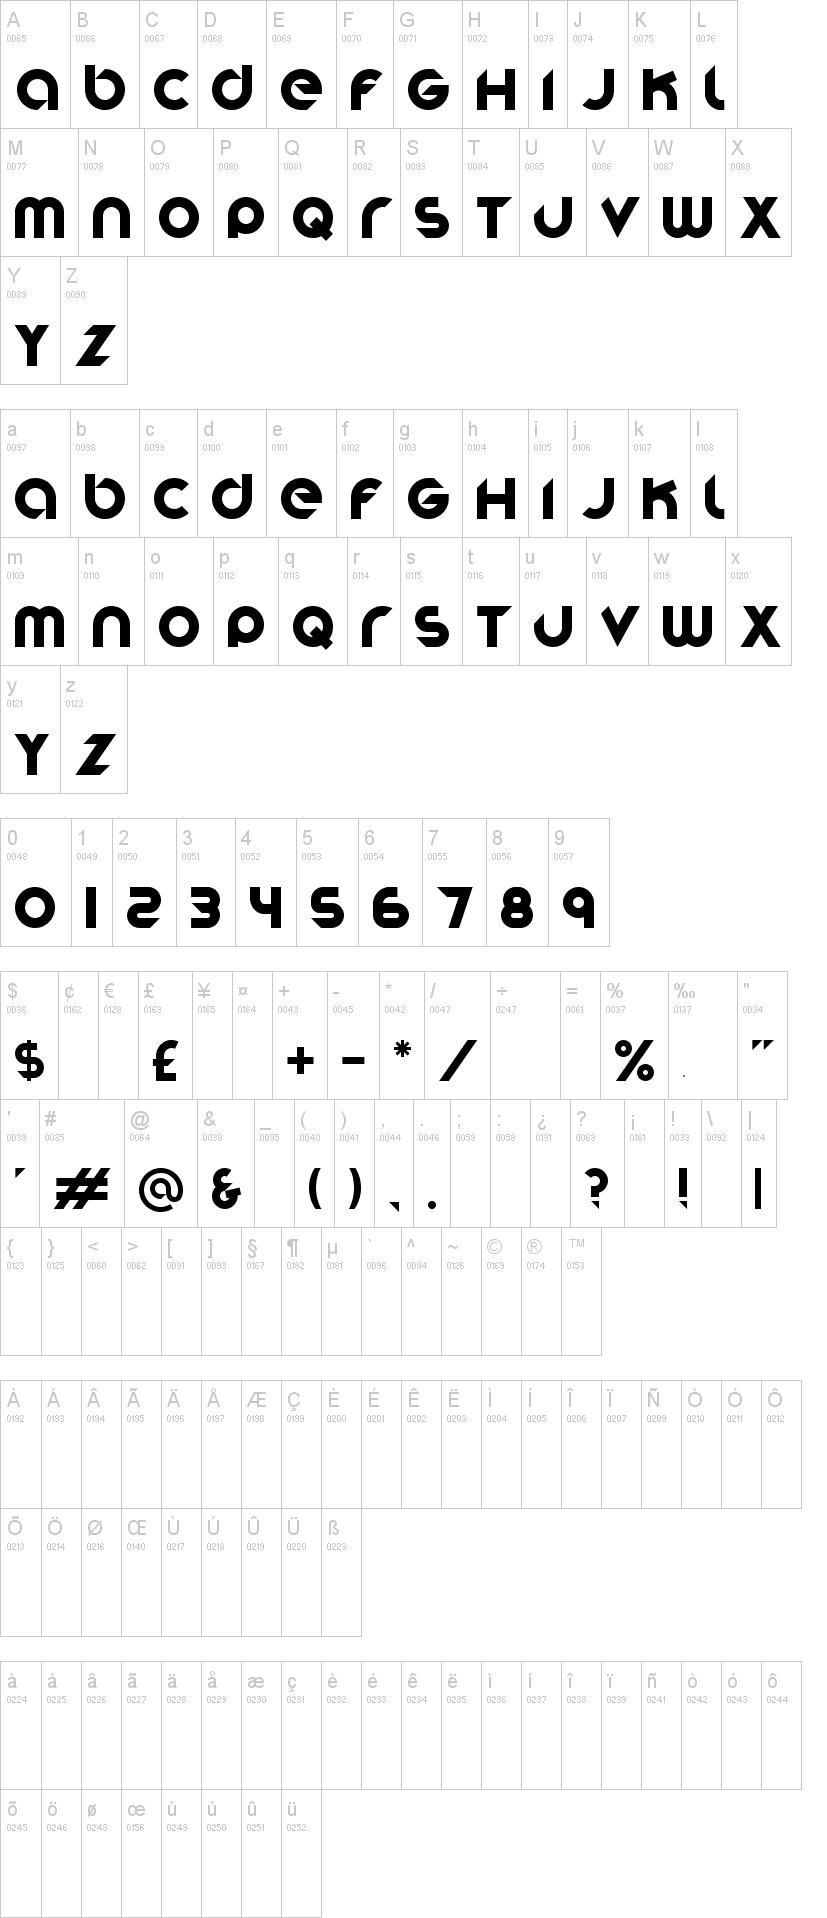 Stereofunk Font | dafont com